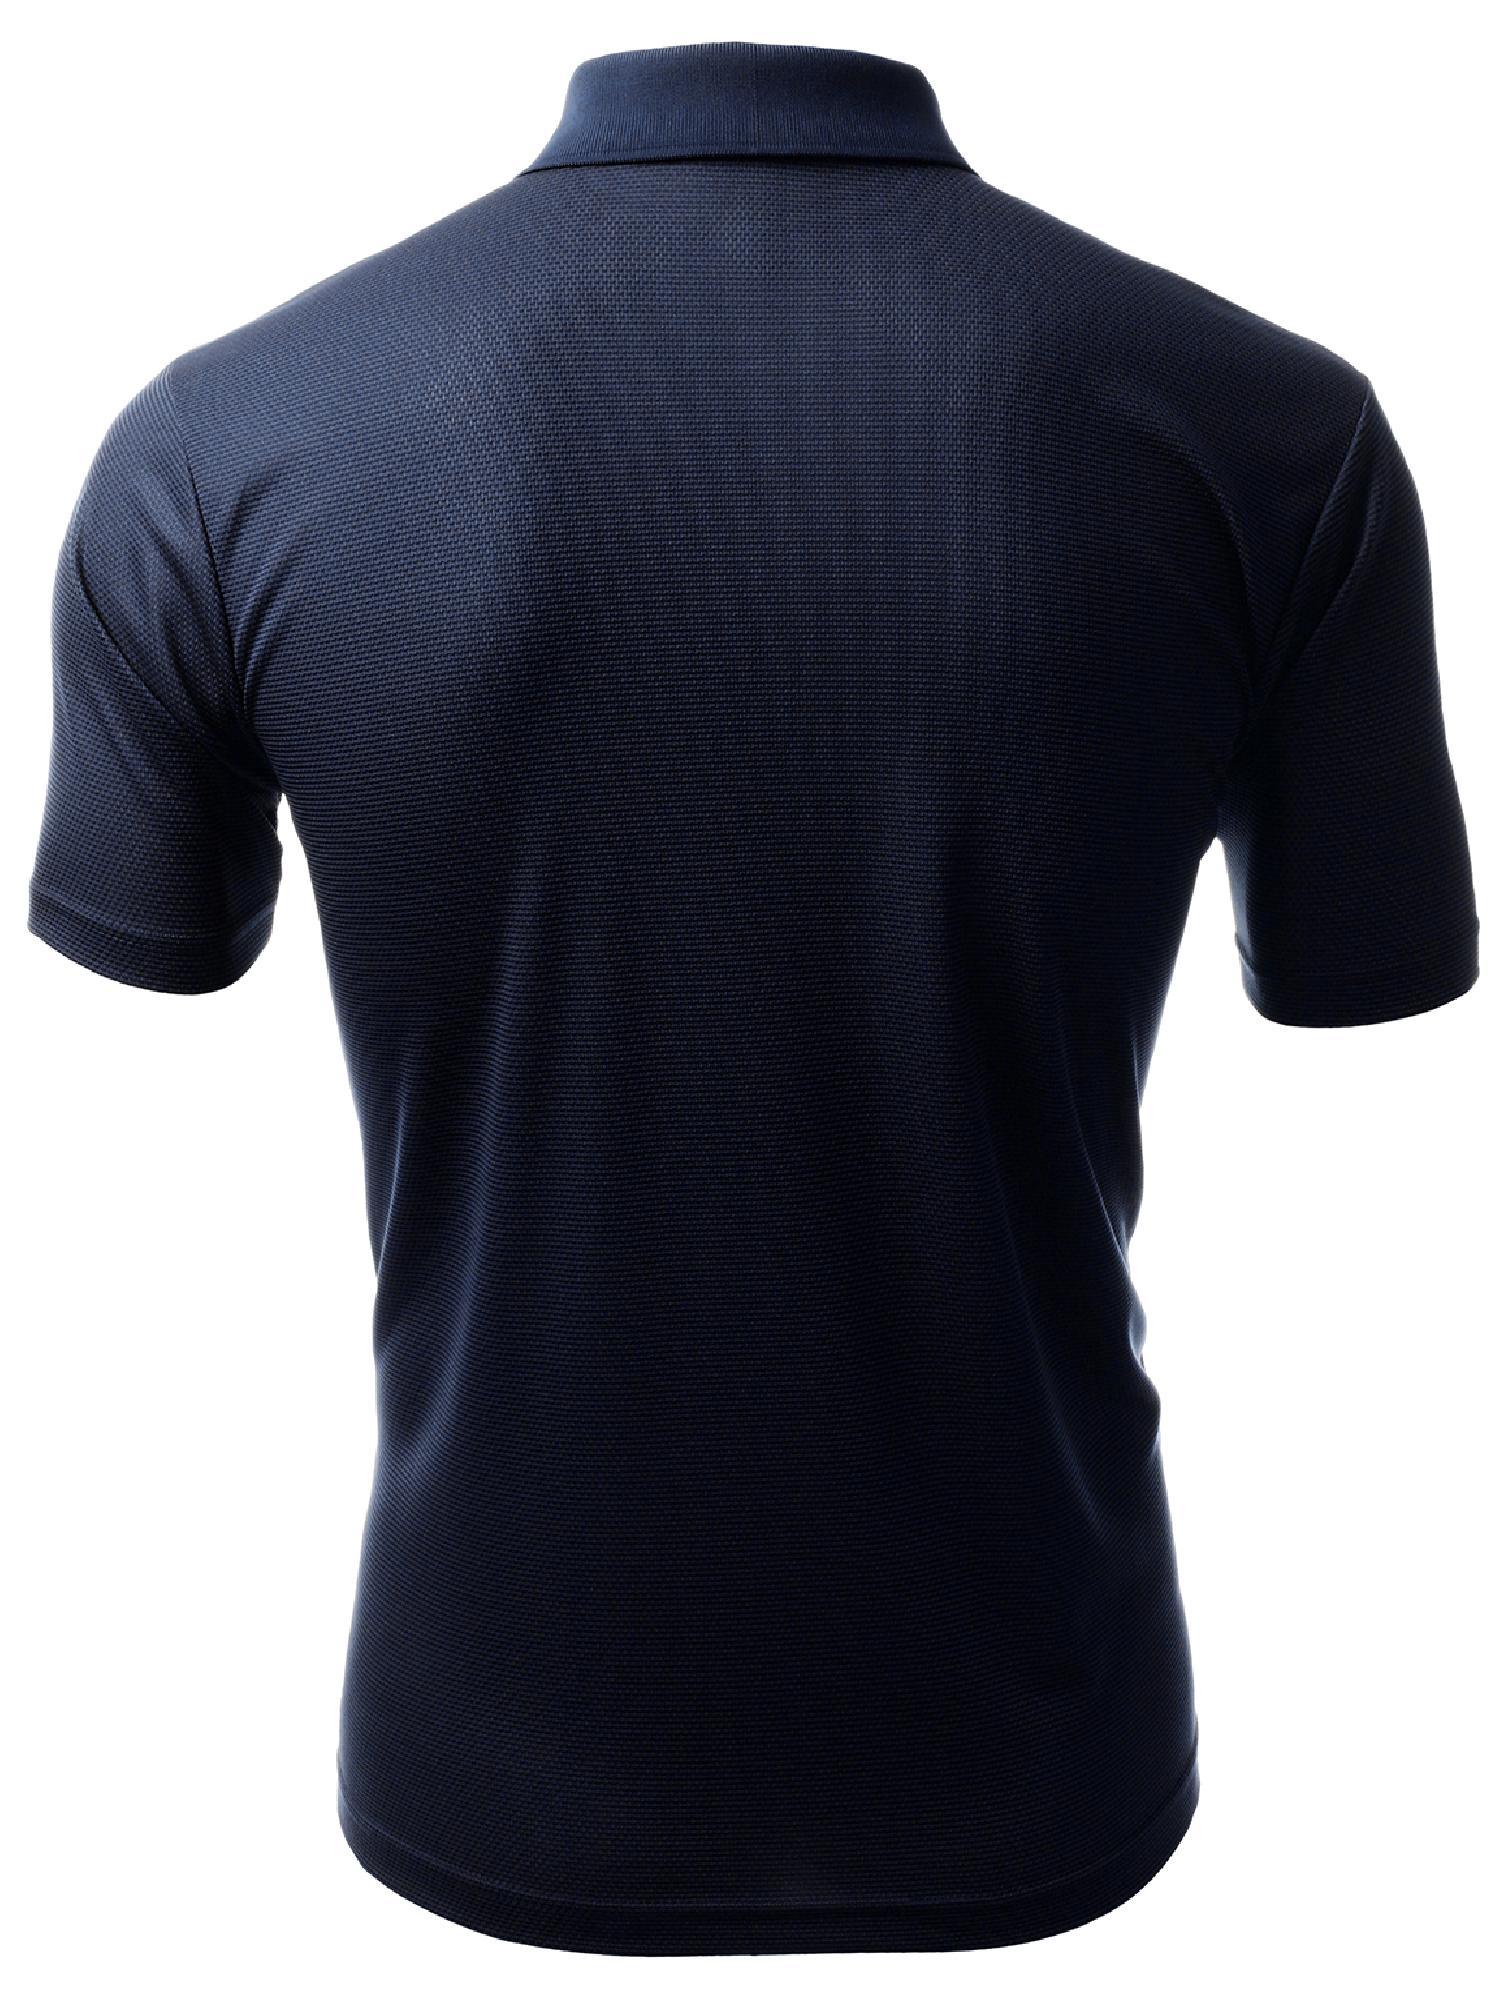 1dc05f5f FashionOutfit - FashionOutfit Men's Coolever Premium Short Sleeve Polo T- Shirts - Walmart.com